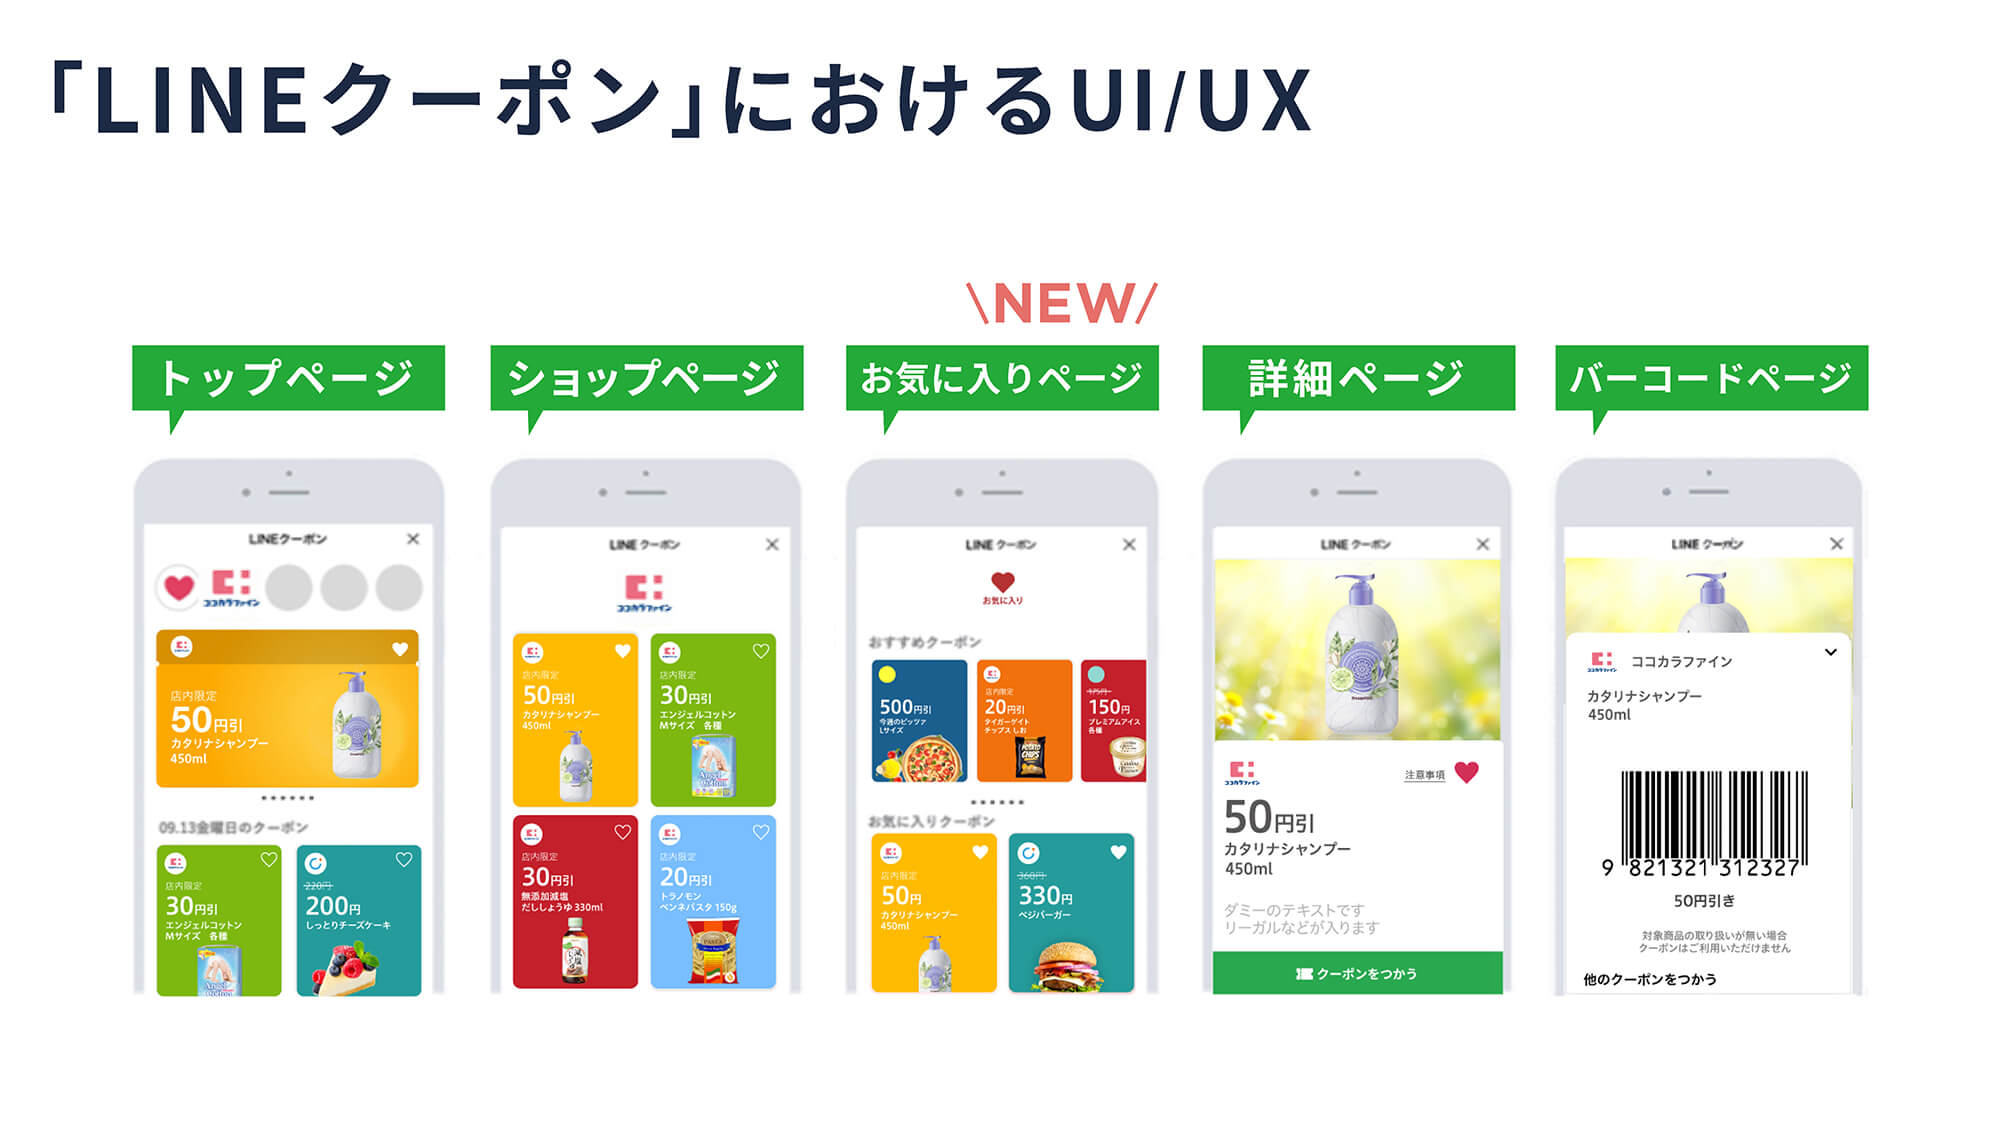 「LINEクーポン」におけるUI/UX 図表